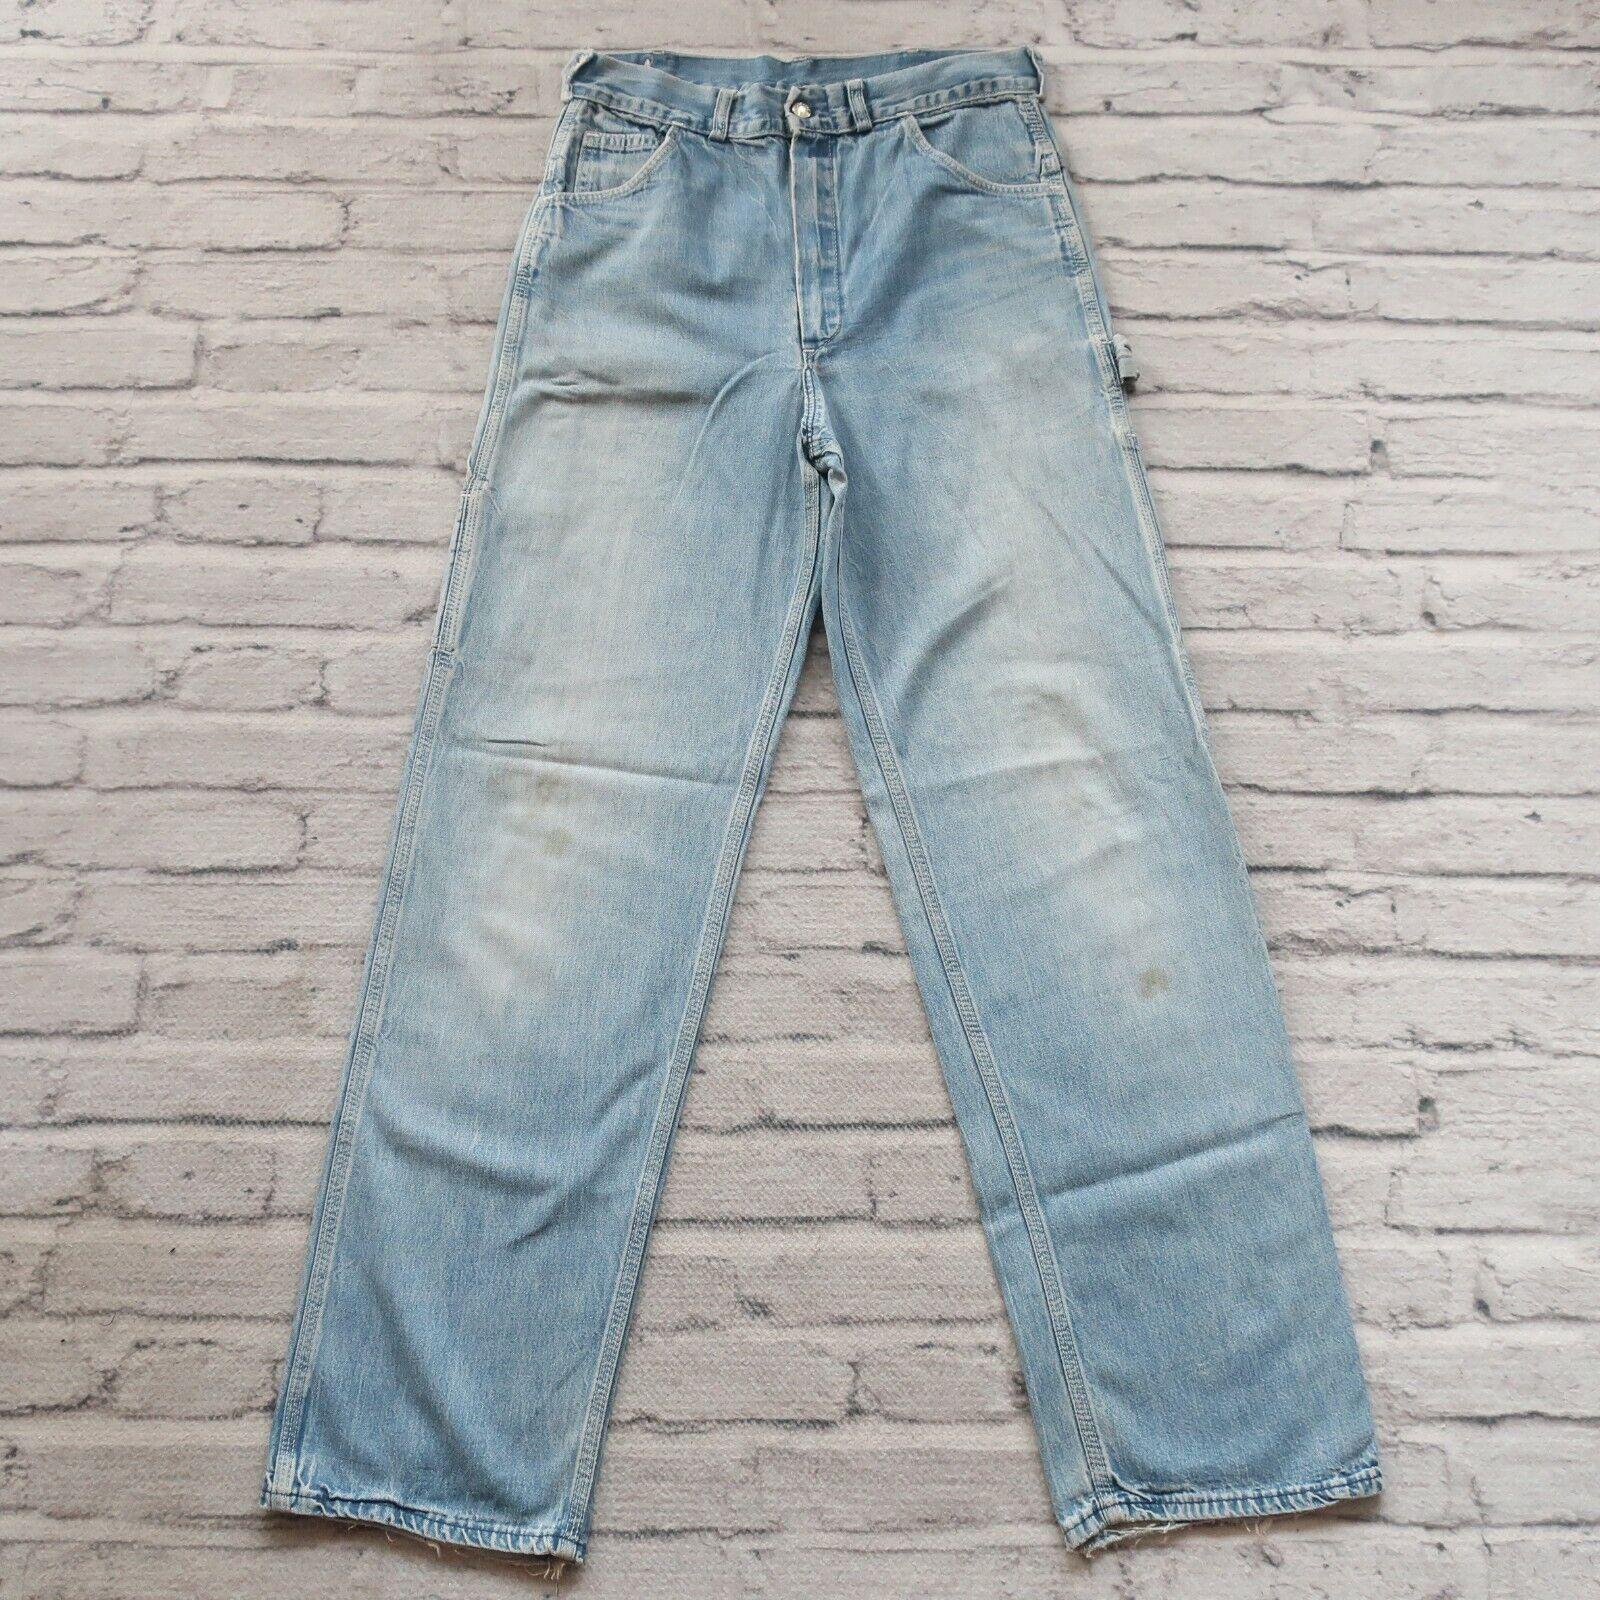 Vintage 60s Madewell Work Denim Jeans Size 30 Chore Carpenter